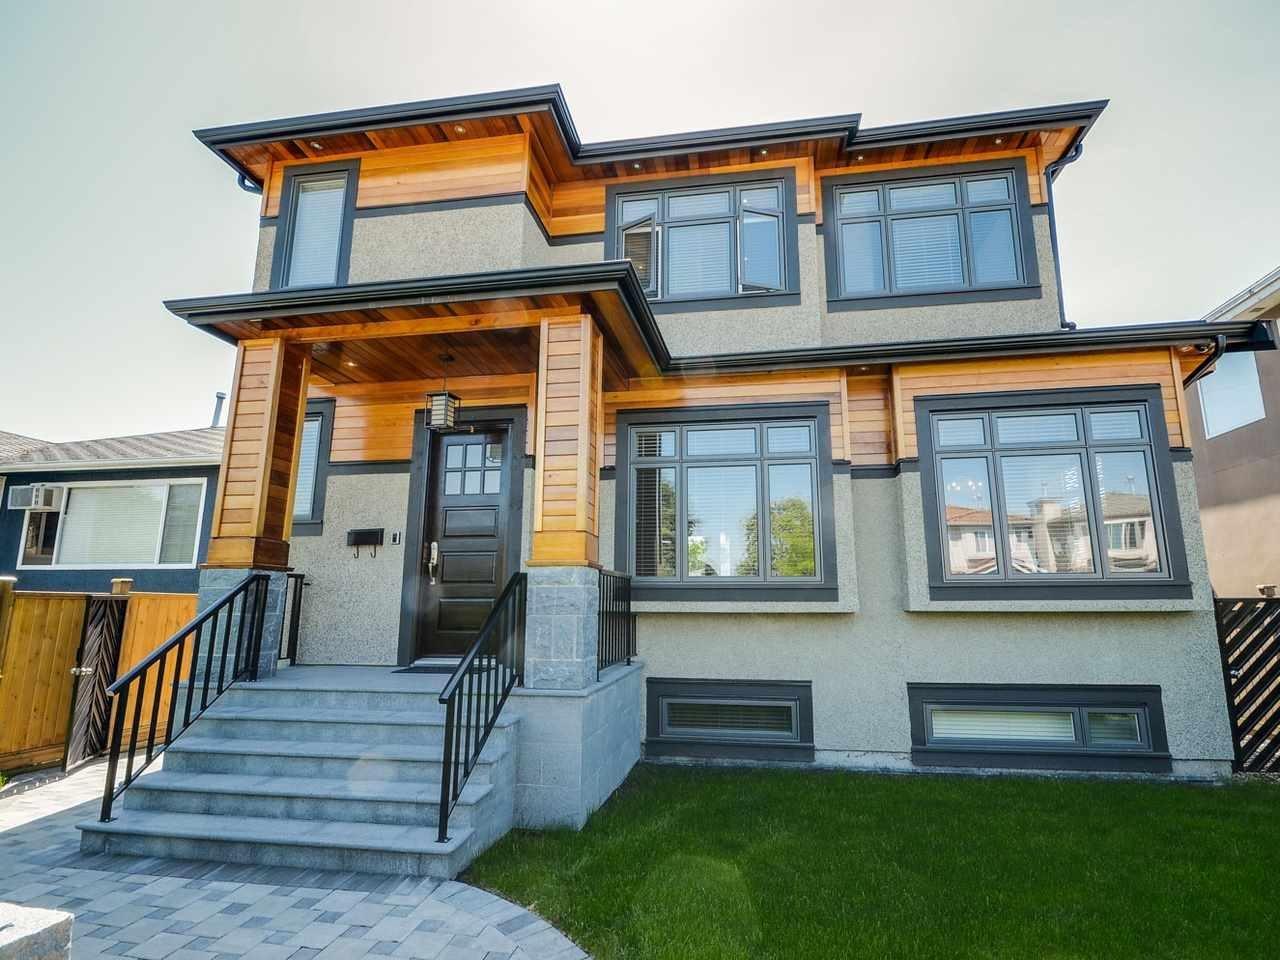 R2131532 - 796 E 52ND AVENUE, South Vancouver, Vancouver, BC - House/Single Family